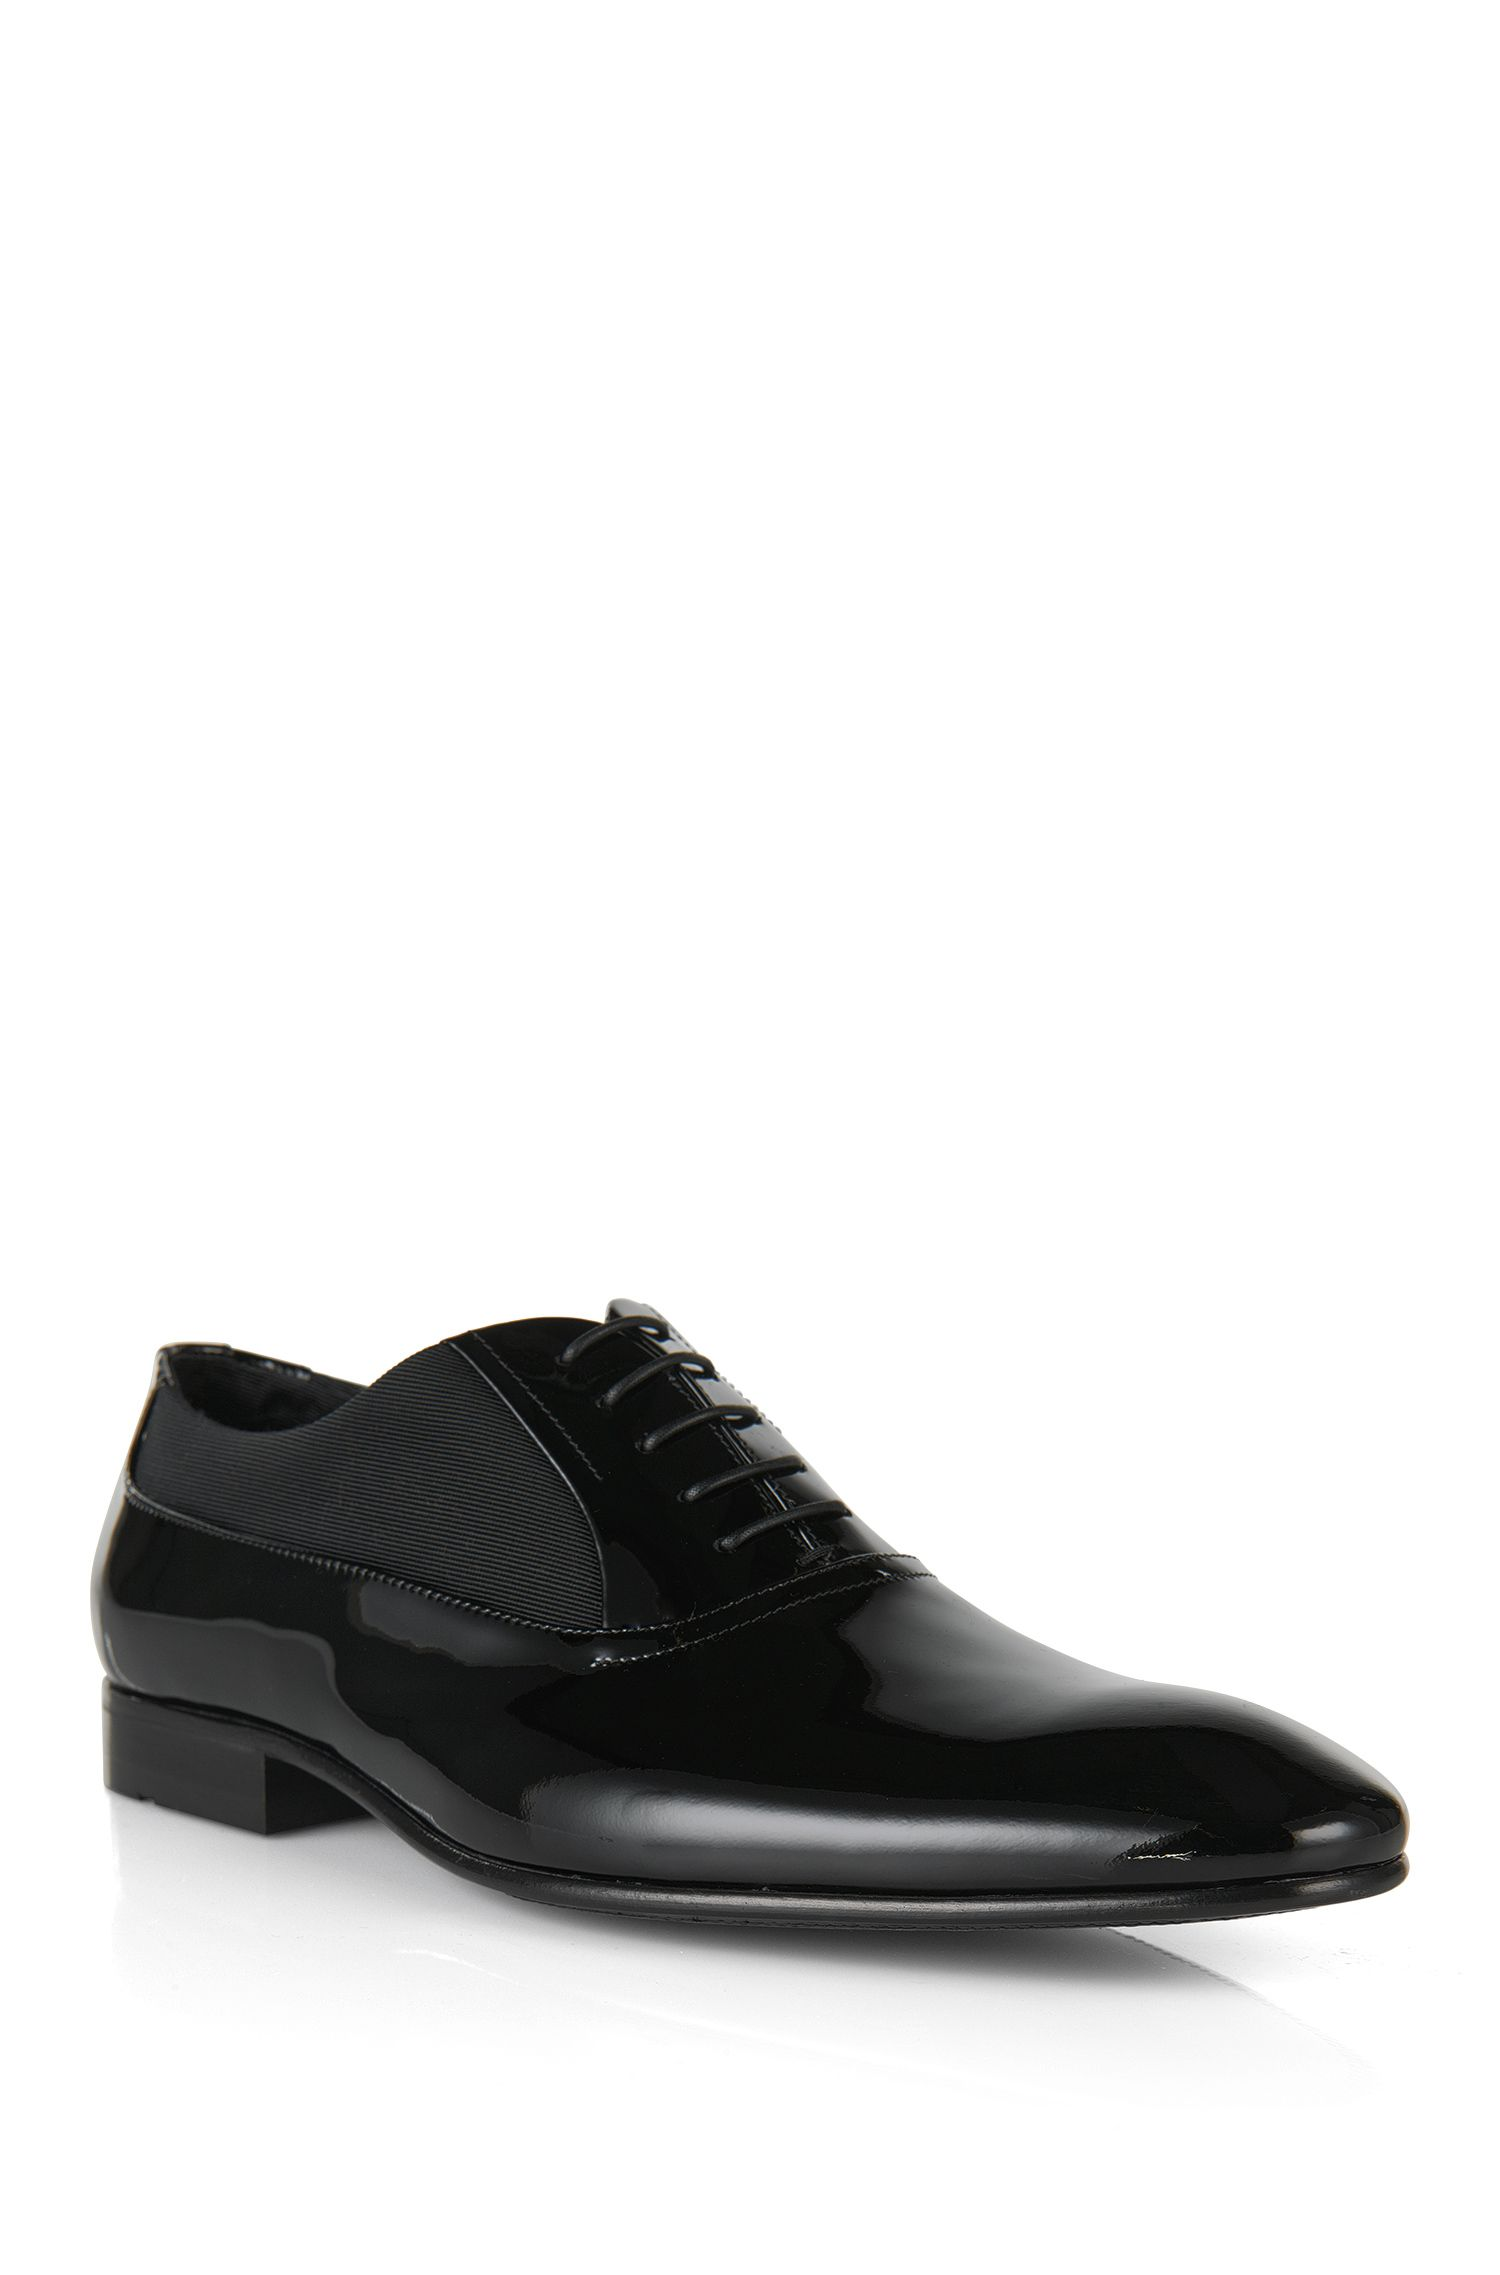 'Evedox' | Calfskin Patent Oxford Dress Shoes